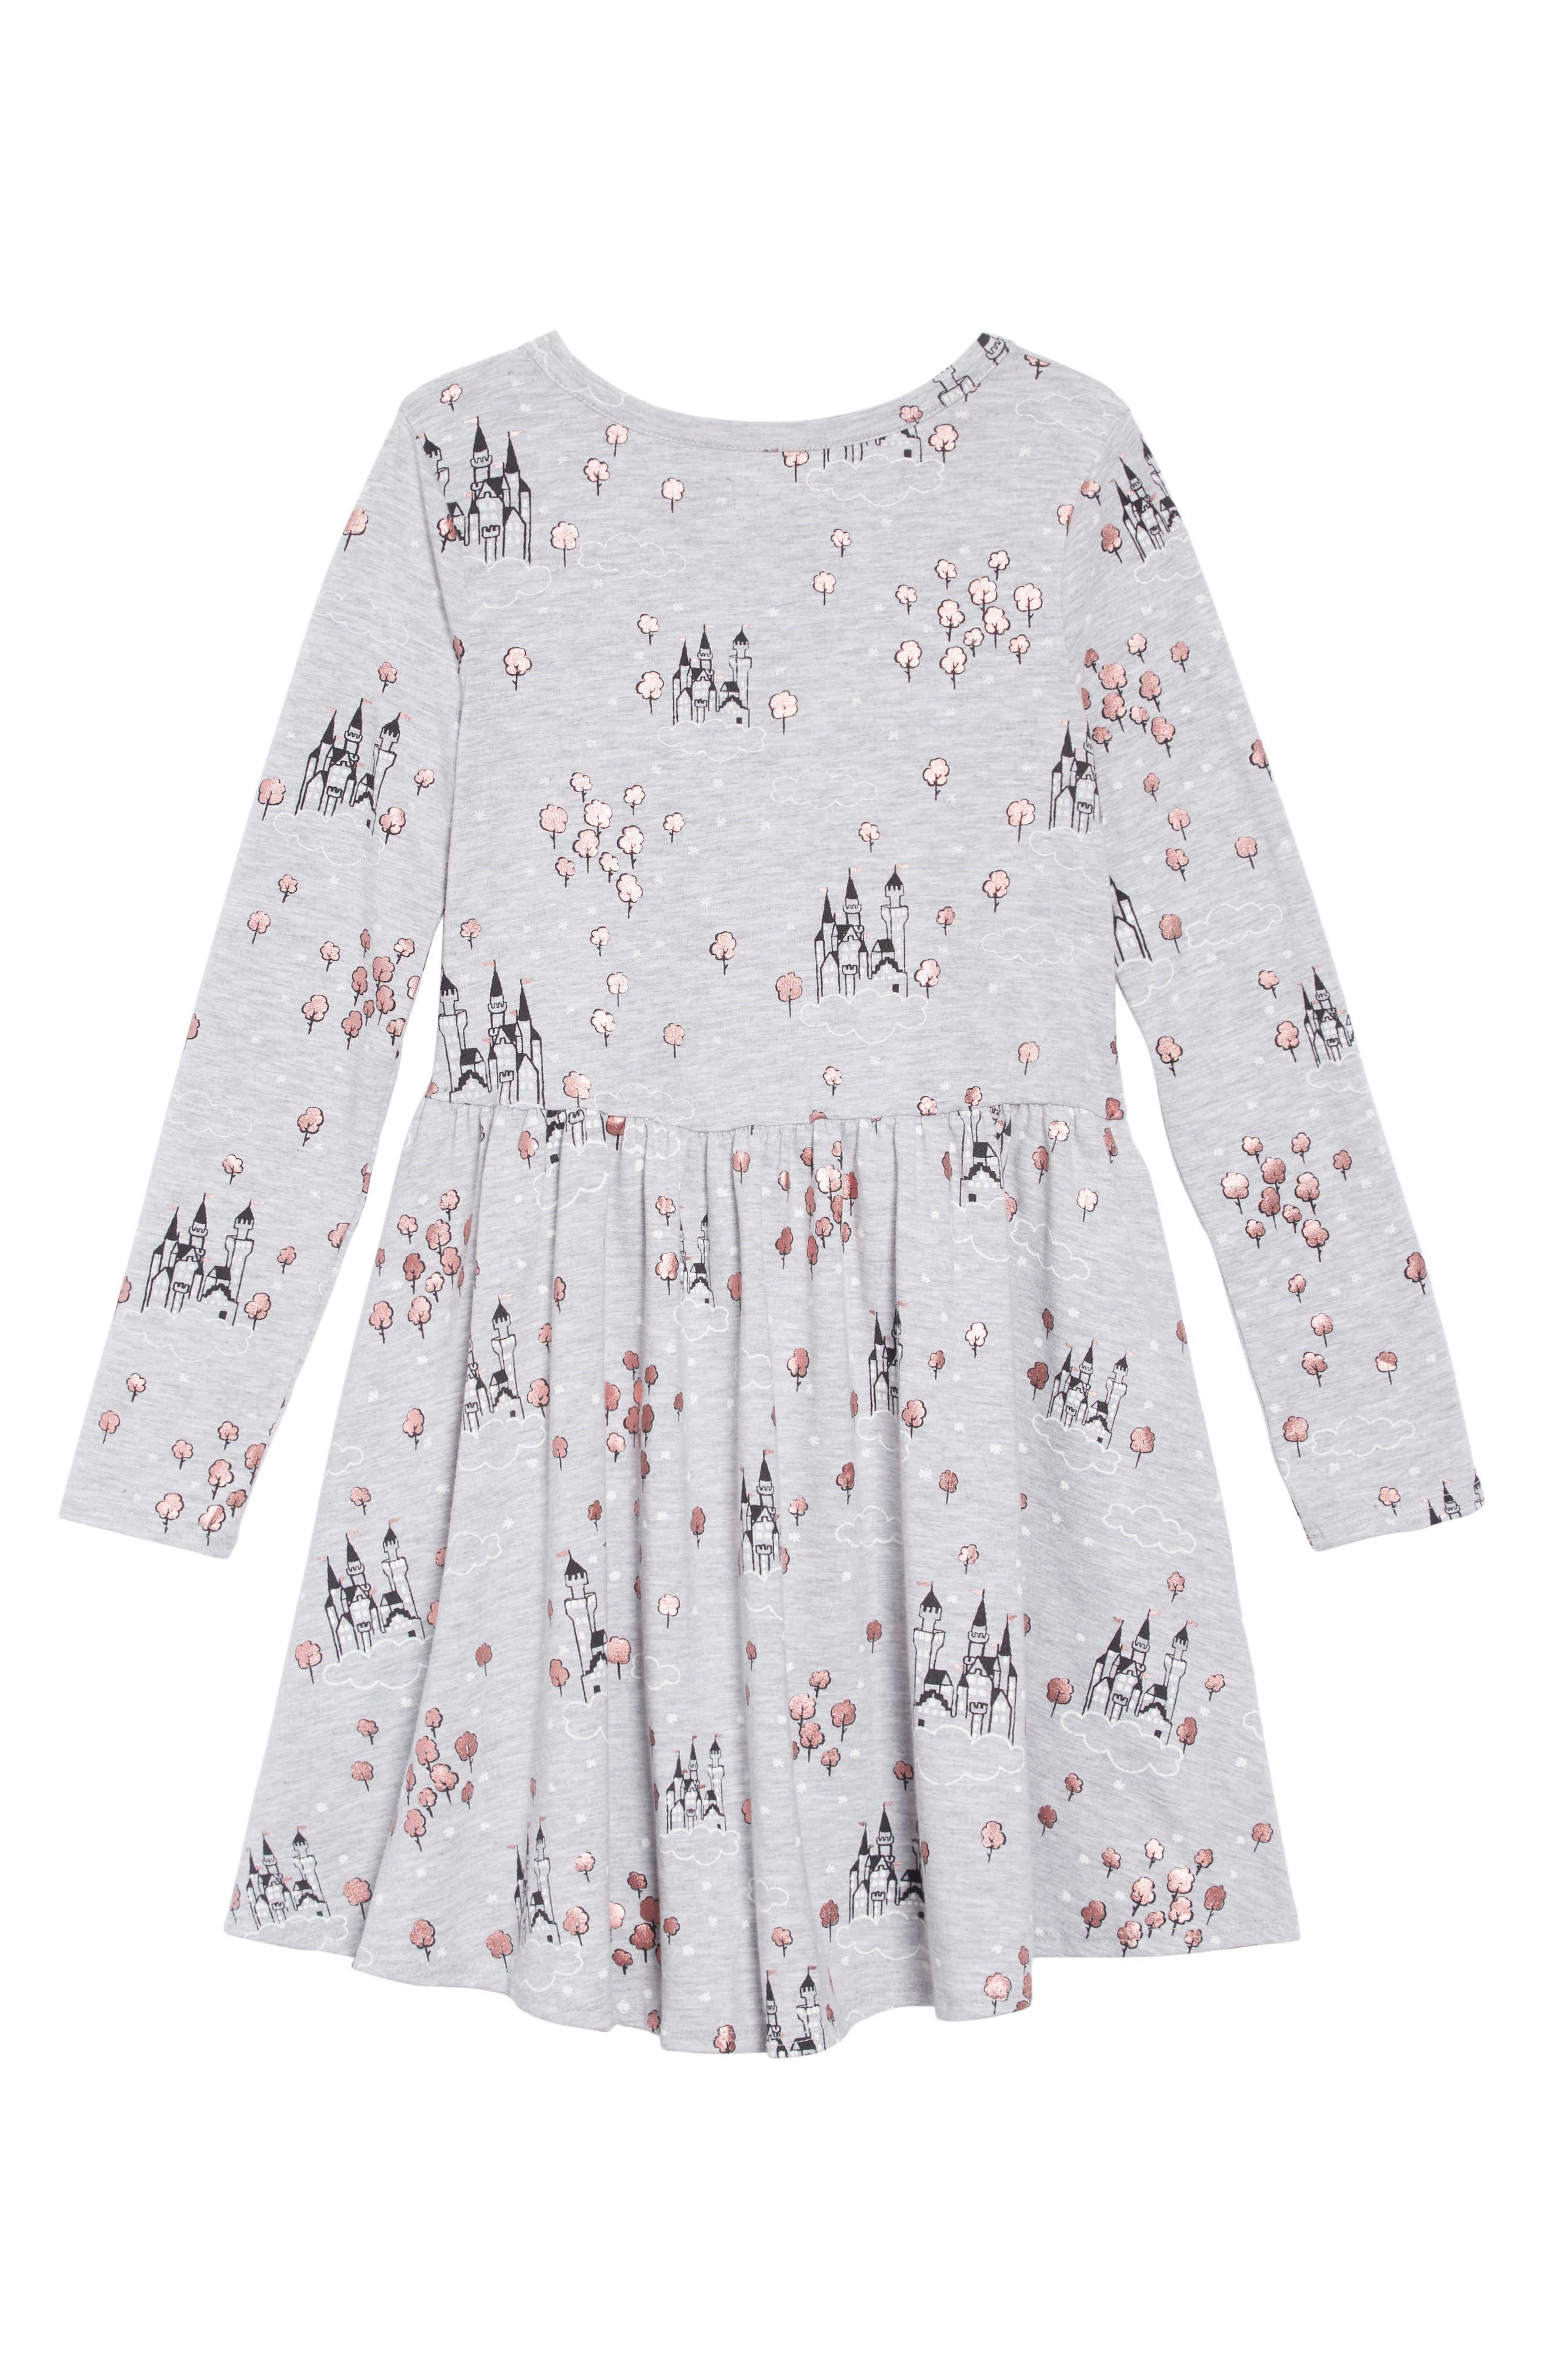 Print Knit Dress,                             Alternate thumbnail 2, color,                             GREY ASH HEATHER CASTLE